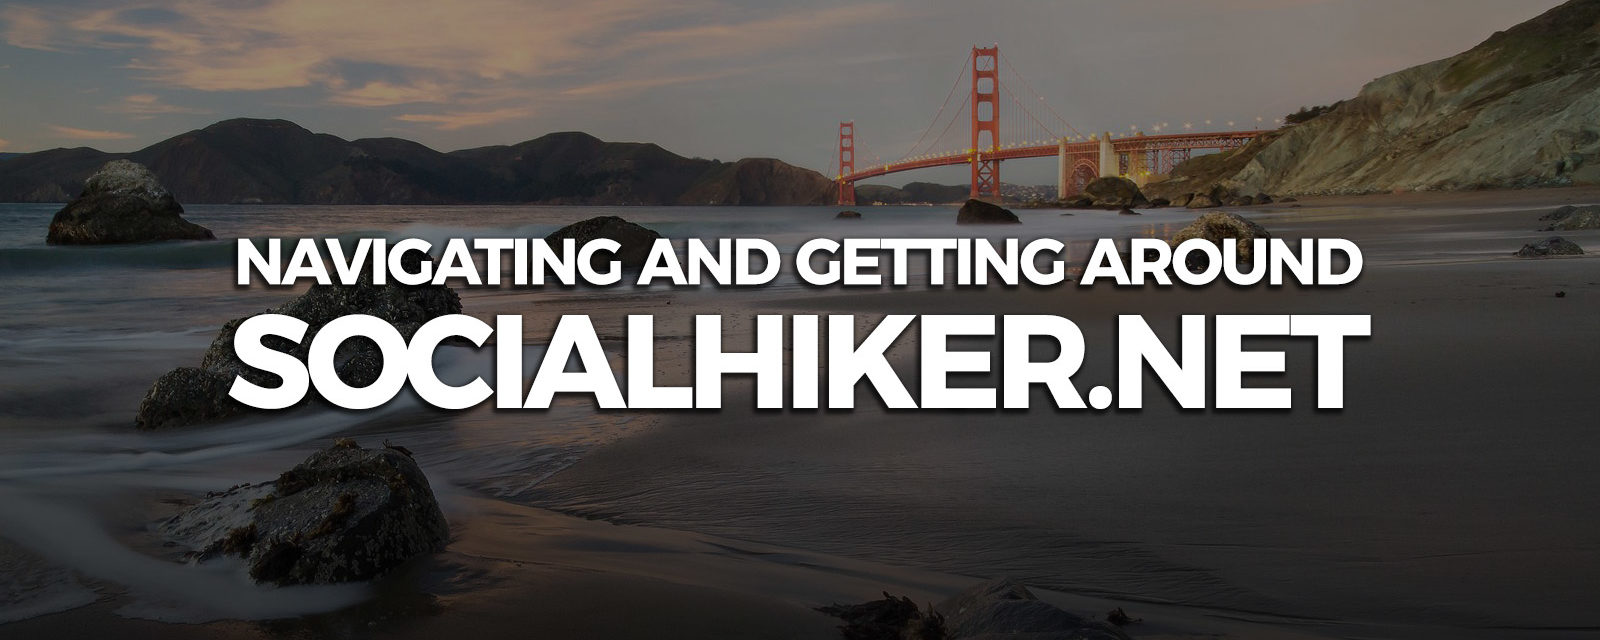 Navigating Social Hiker